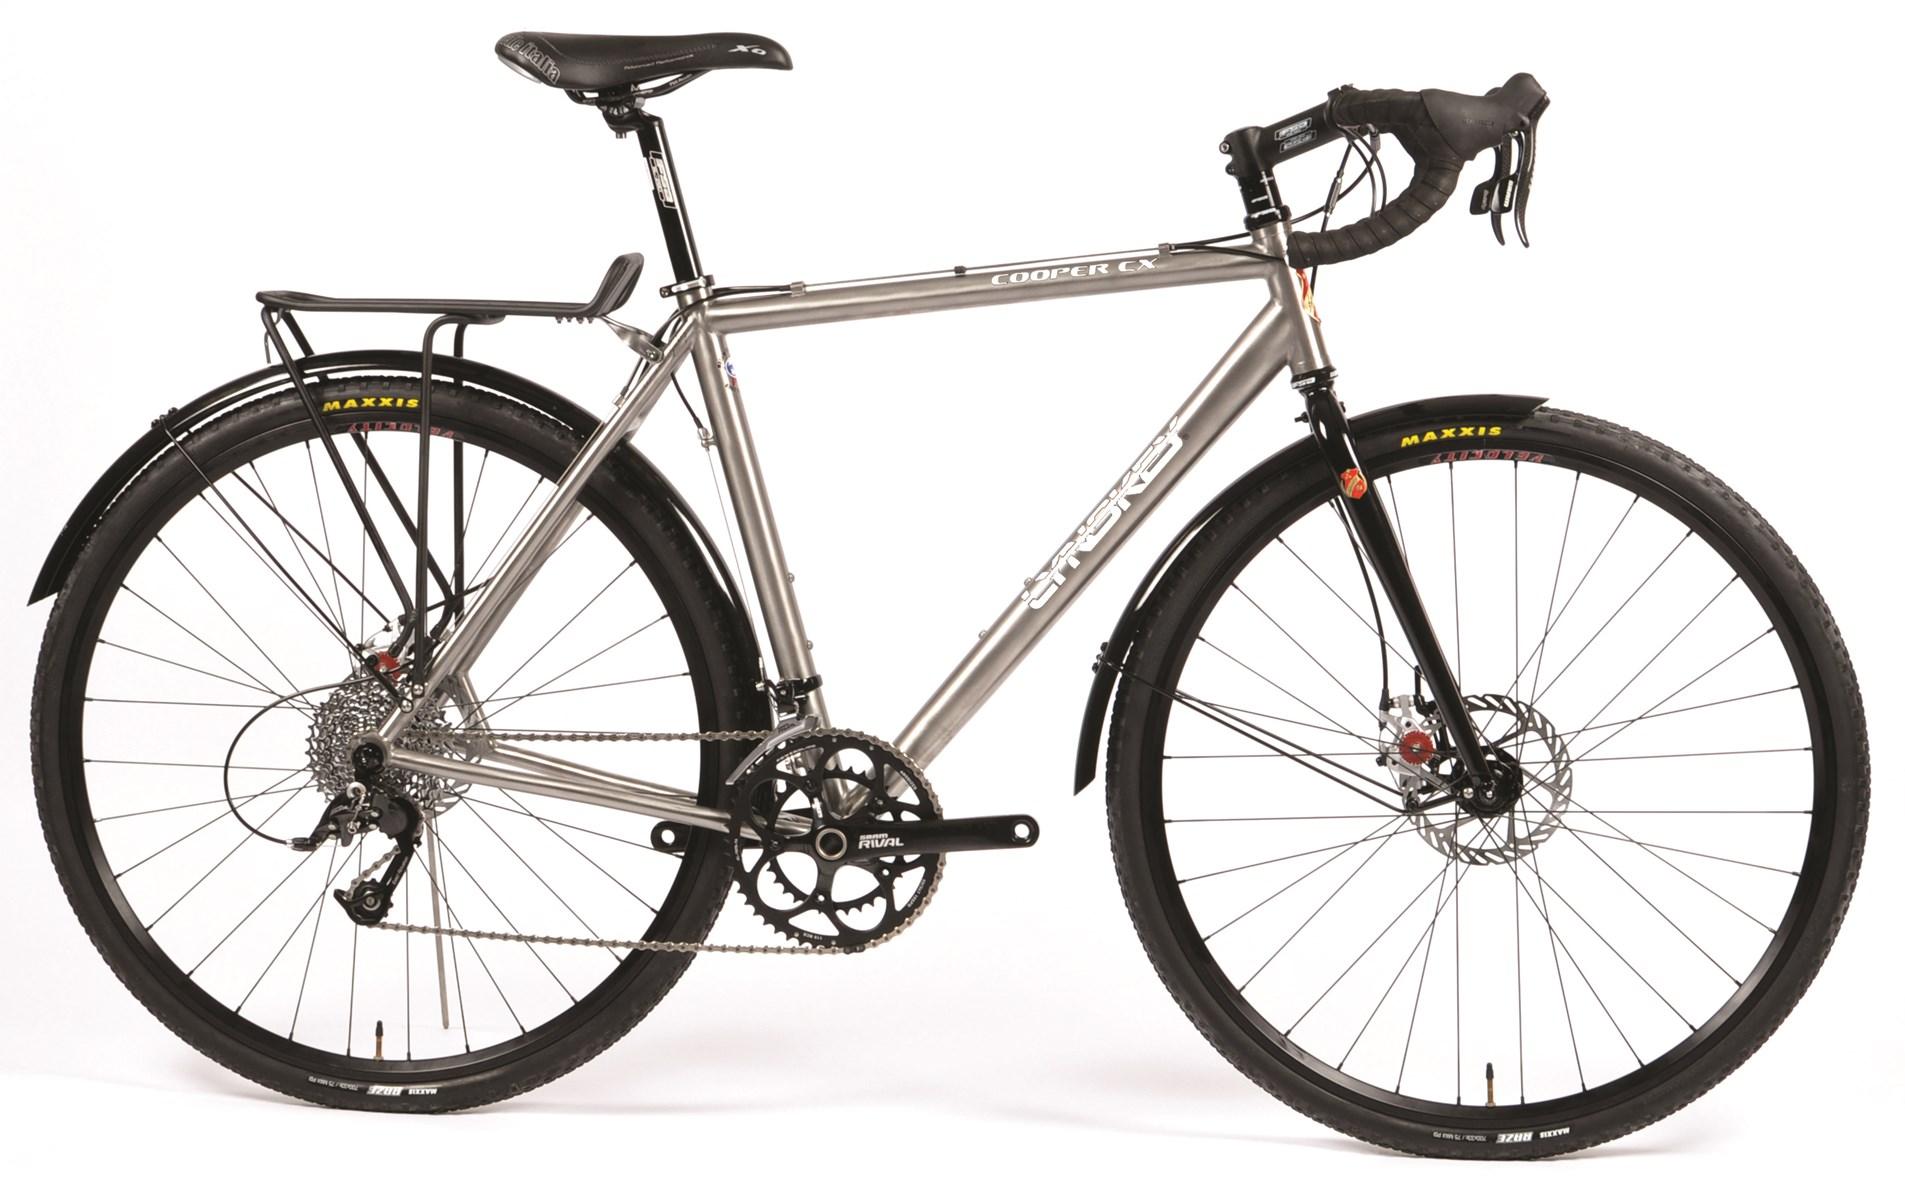 Lynskey Cooper CX Ultegra 11 Speed Titanium Cyclocross Bike - Buy ...